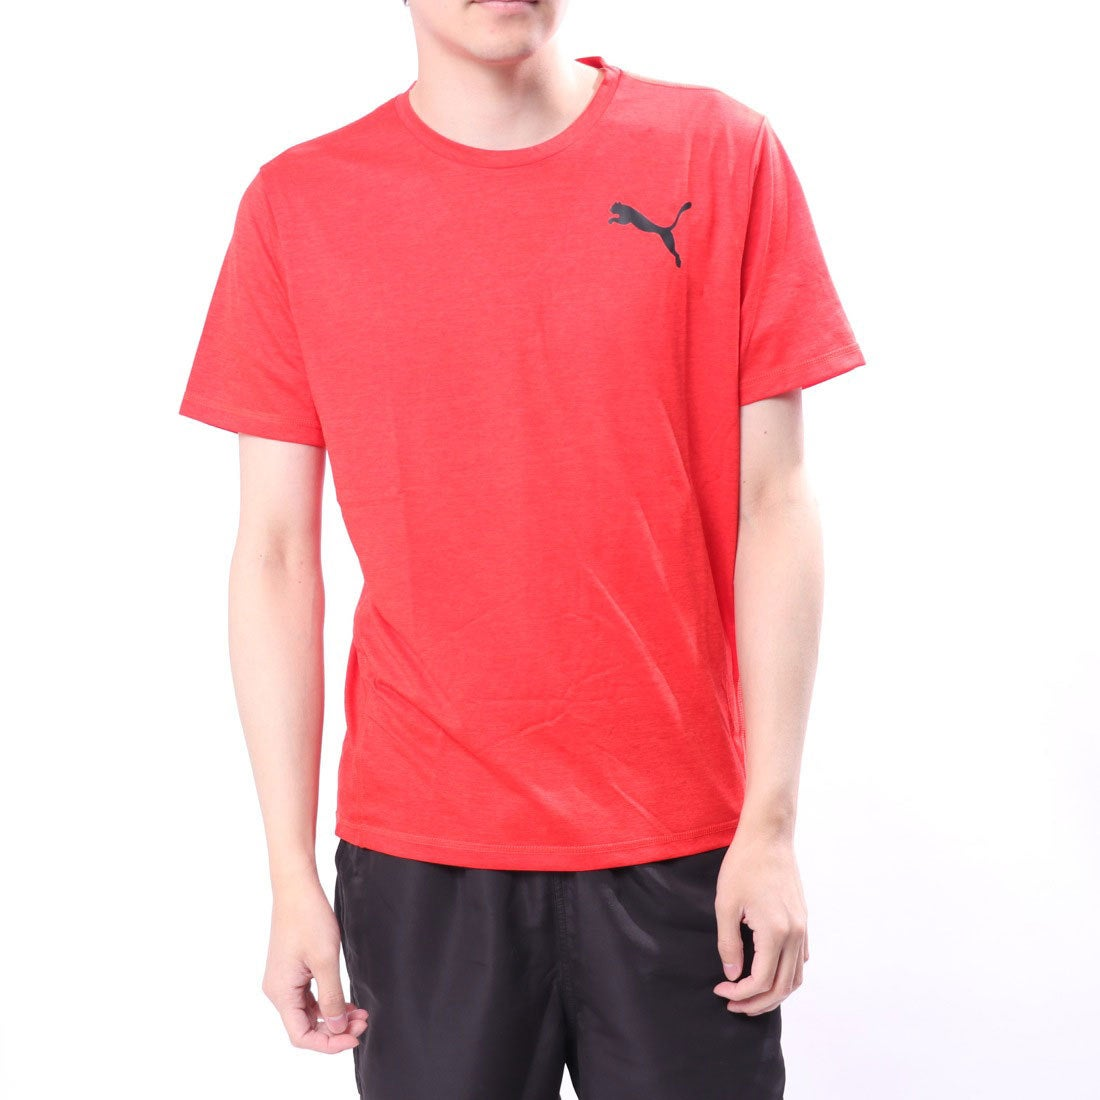 f9461d5cb25de プーマ PUMA メンズ 半袖機能Tシャツ ピュアテック ヘザーTシャツ 515888 -スポーツ&アウトドア通販 ロコンドスポーツ (LOCOSPO)